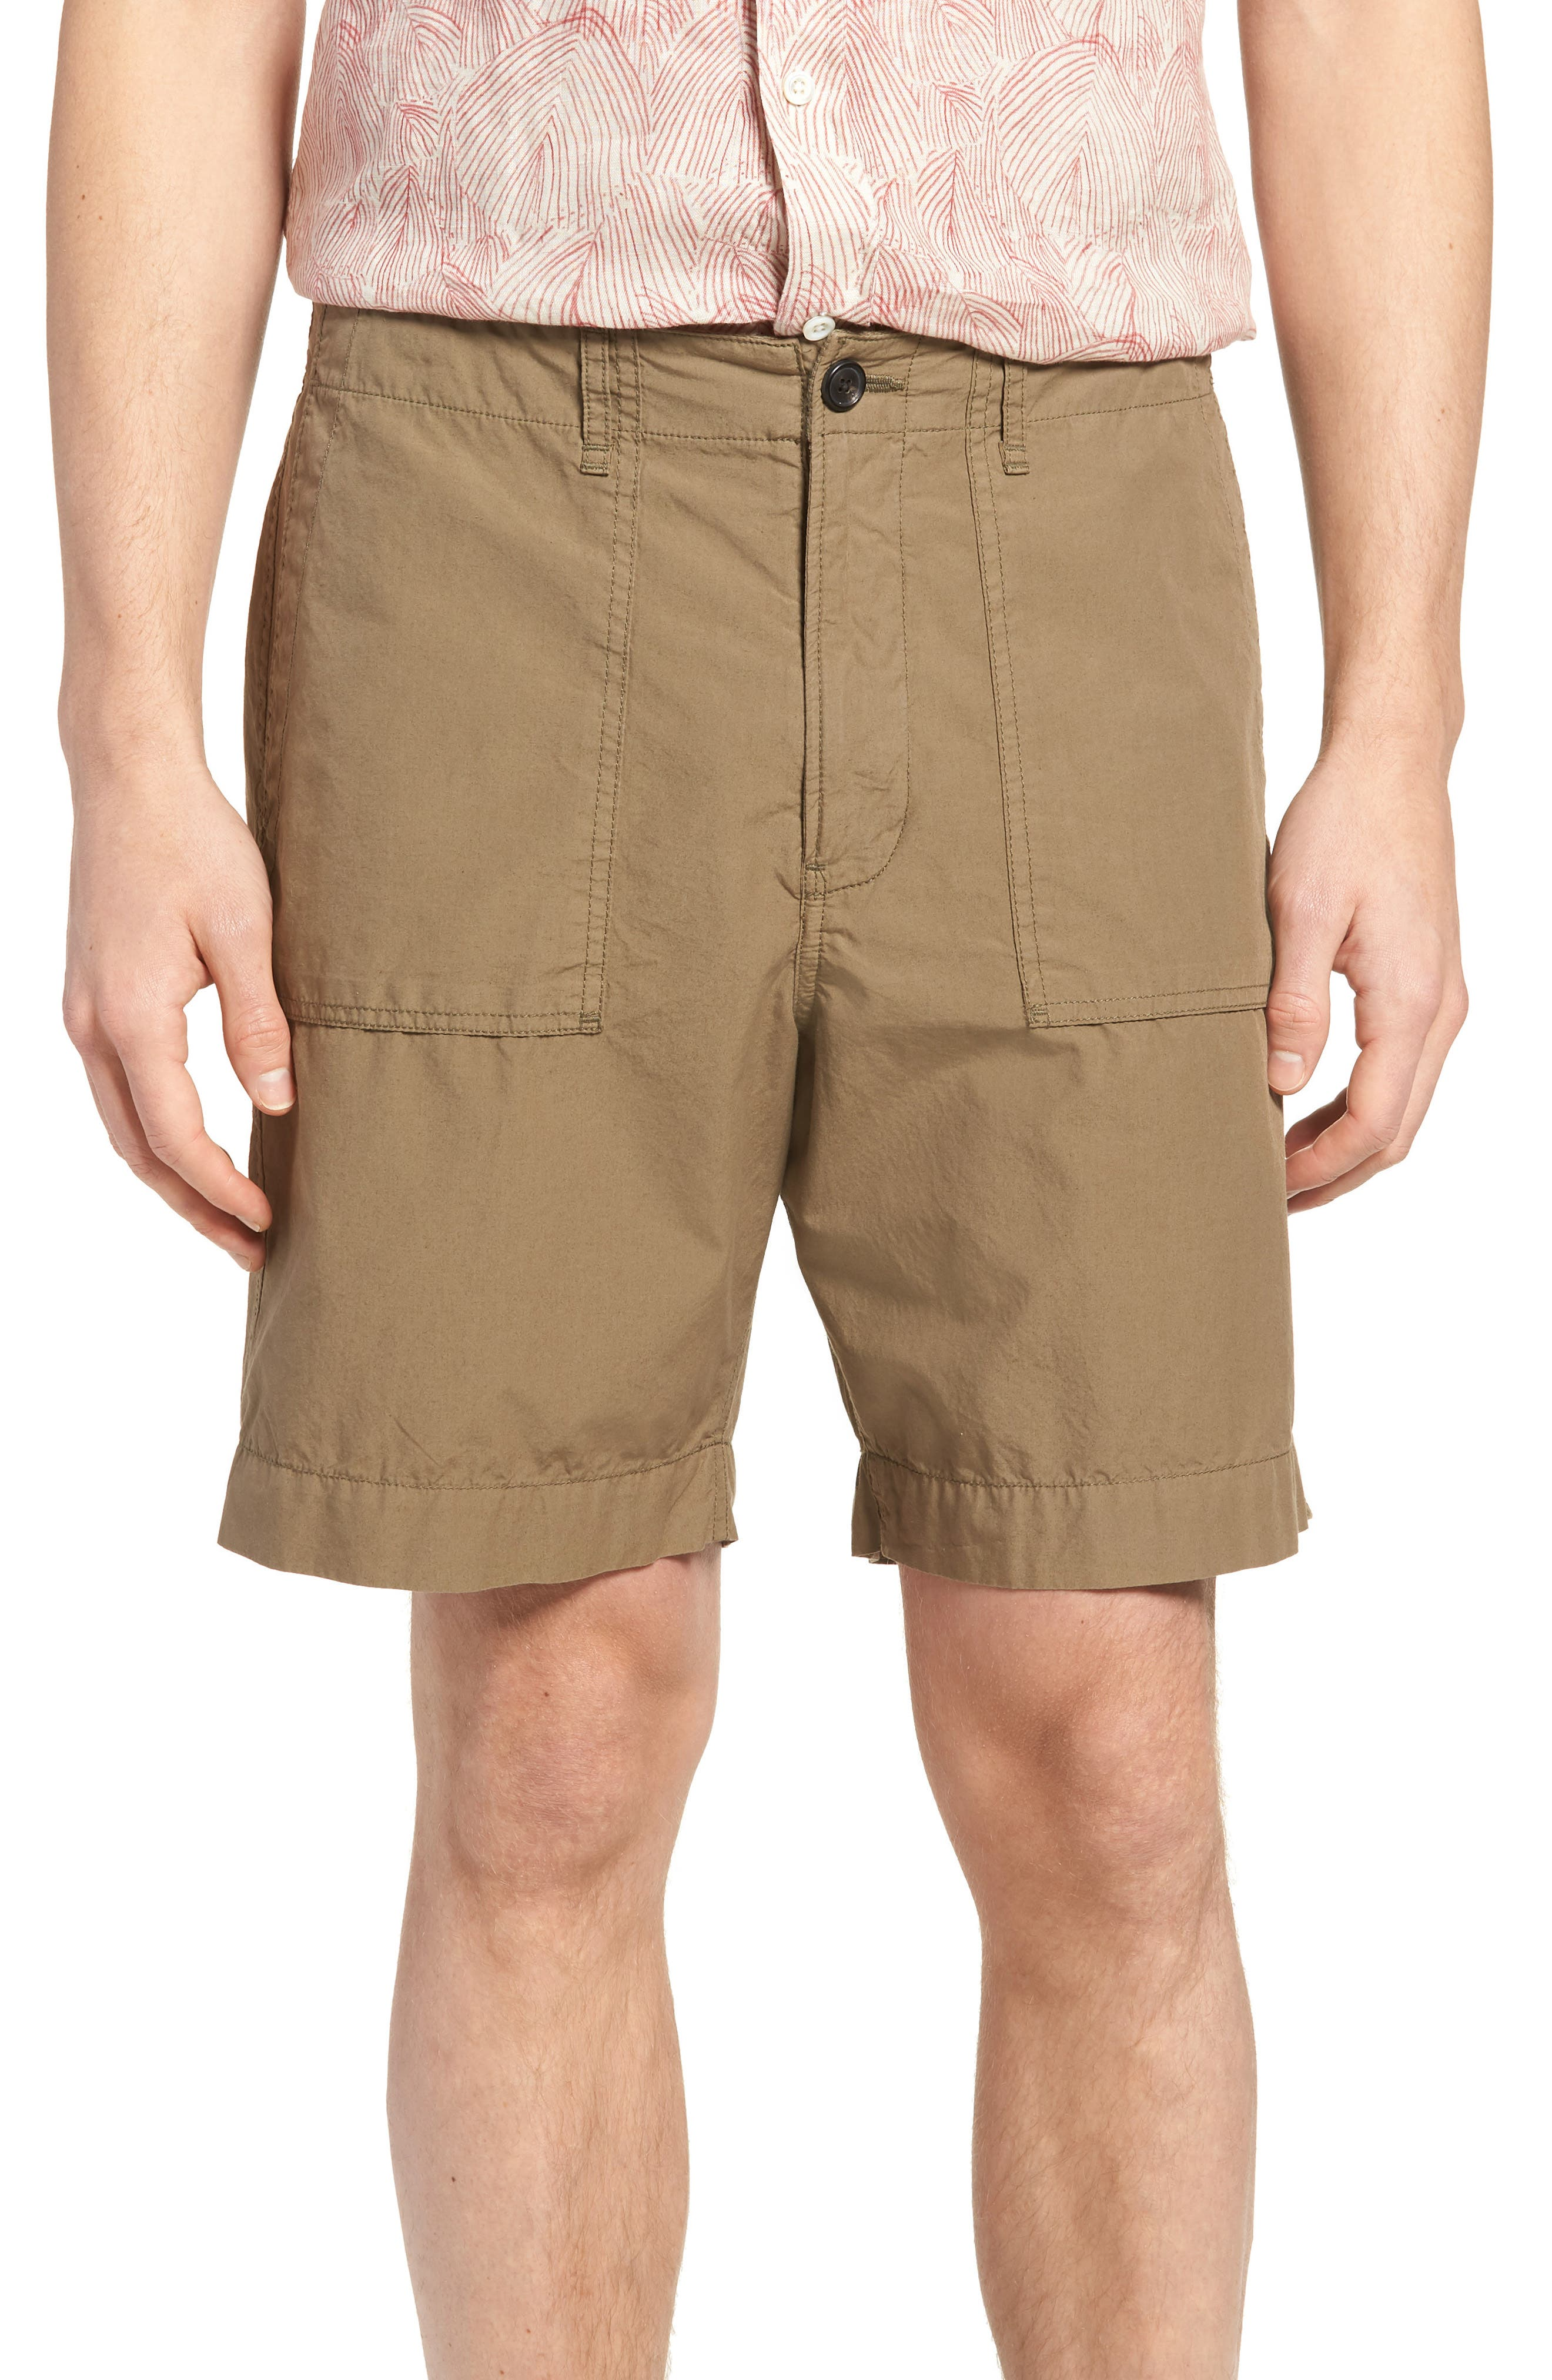 Everett Shorts,                         Main,                         color, Olive